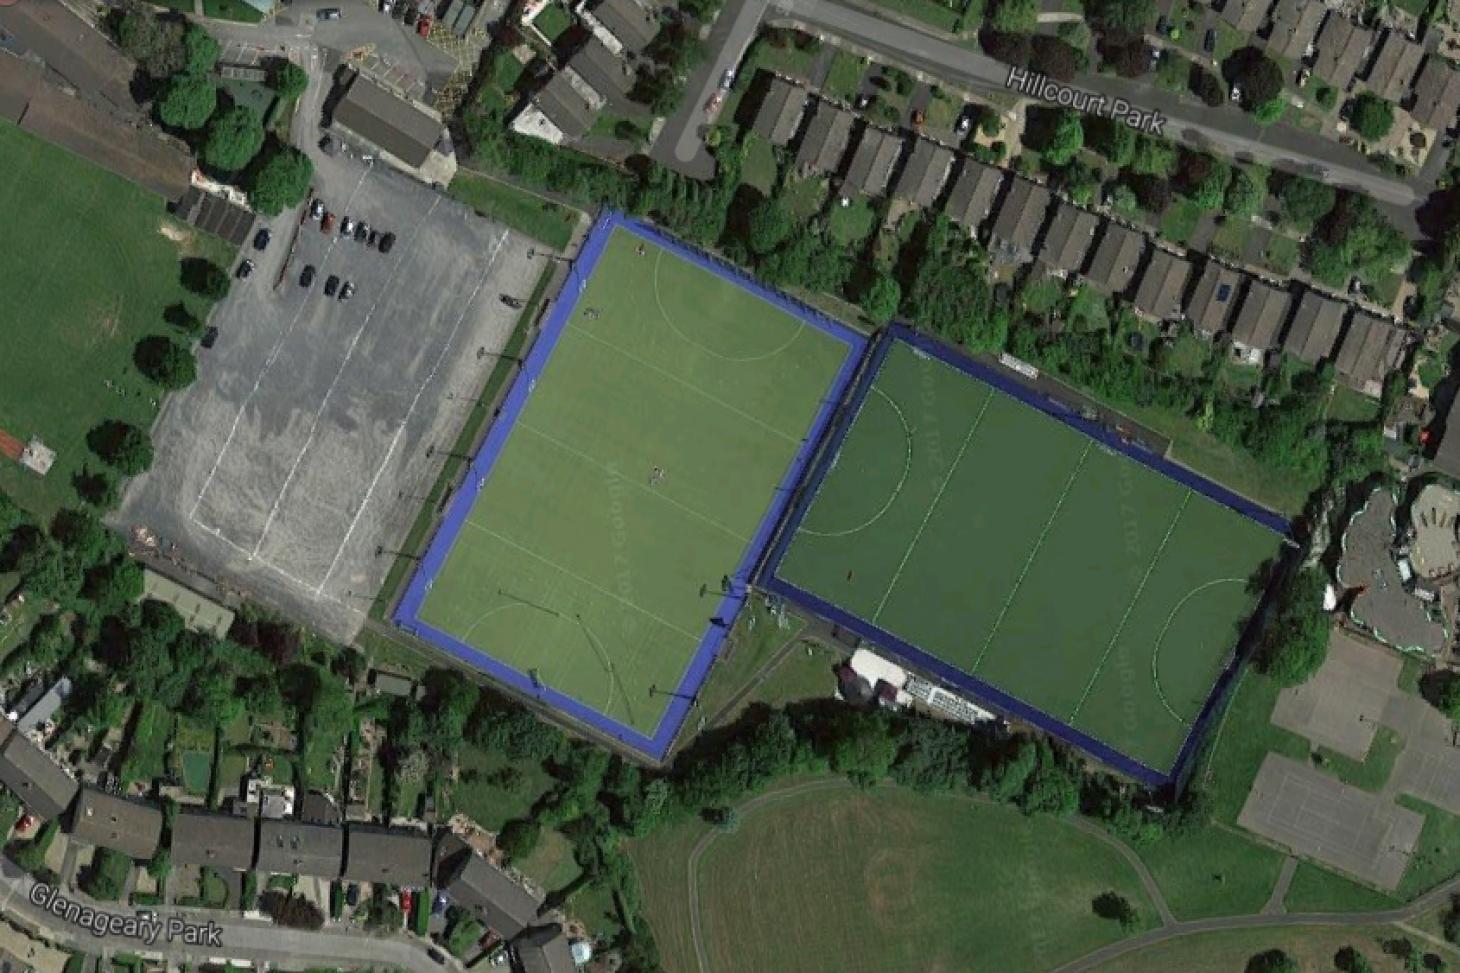 Rathdown School Campus Outdoor | Astroturf hockey pitch